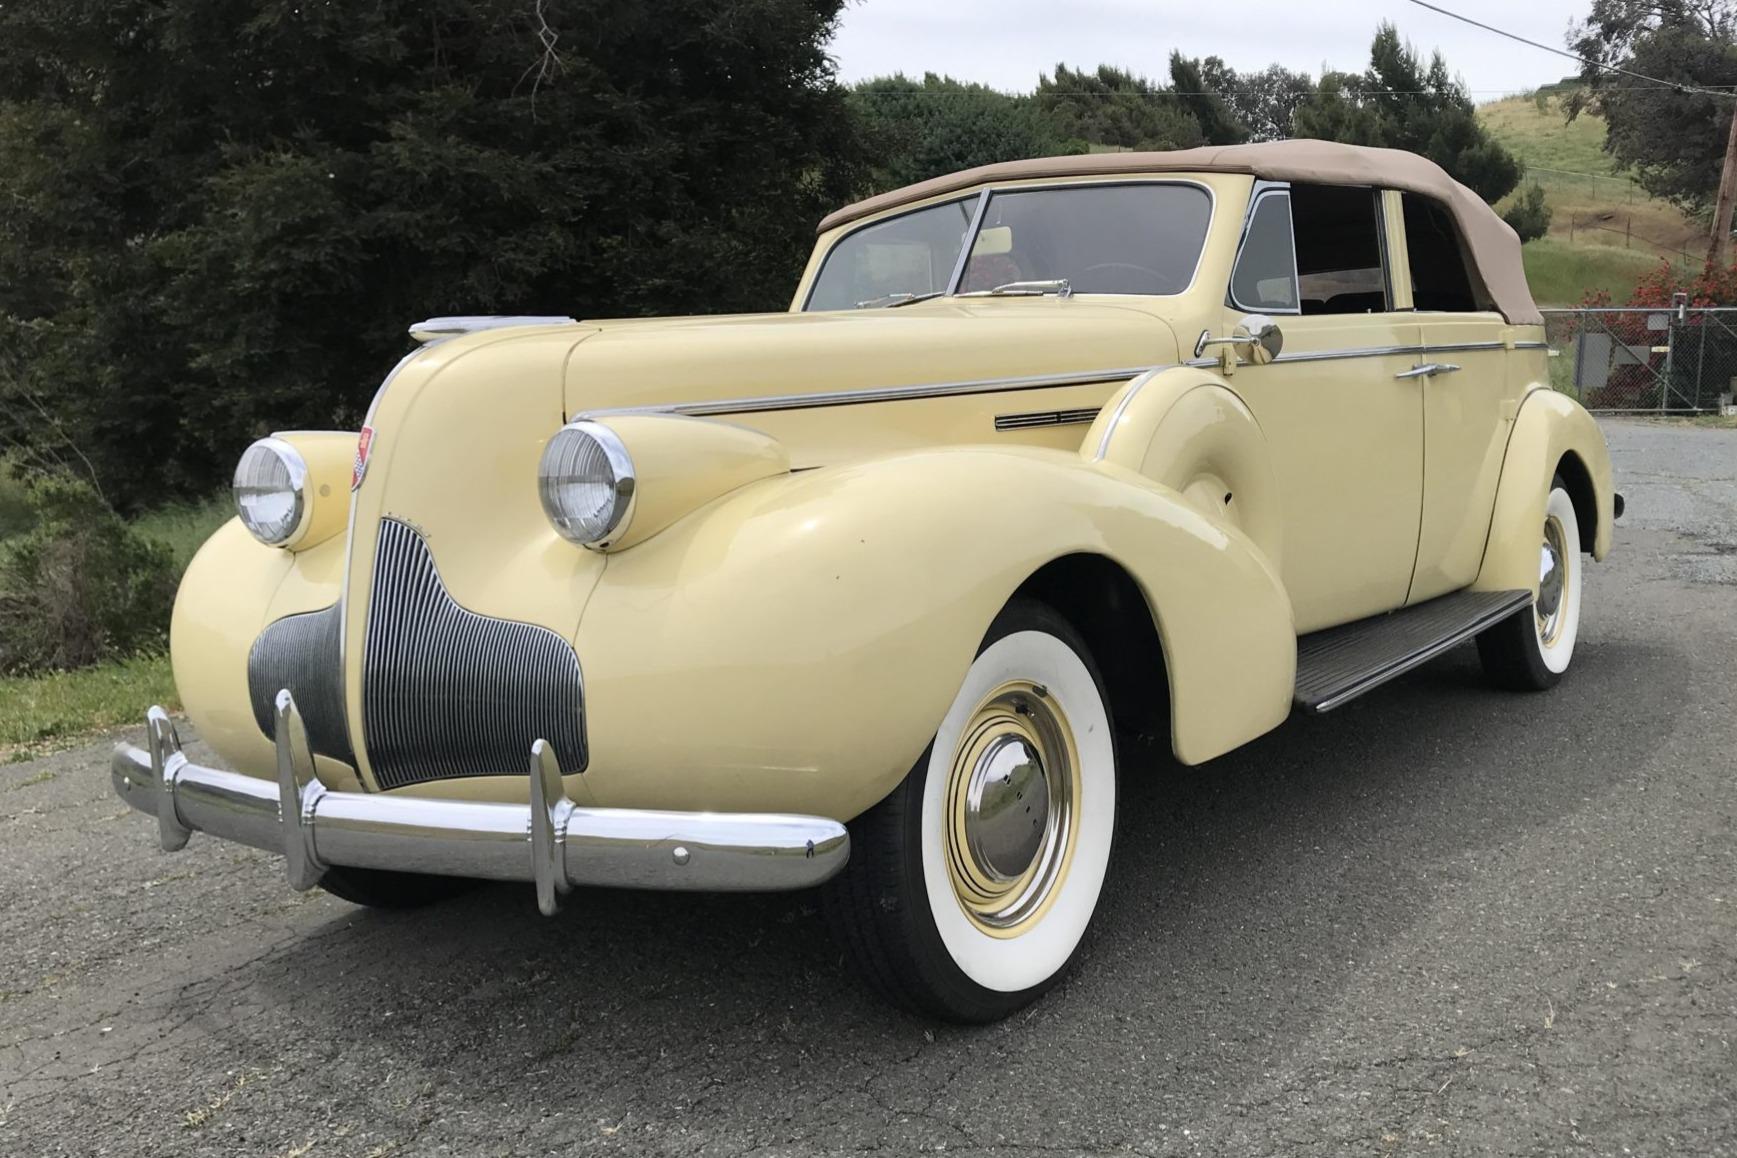 1939 Buick Roadmaster Phaeton Convertible 81-C 2